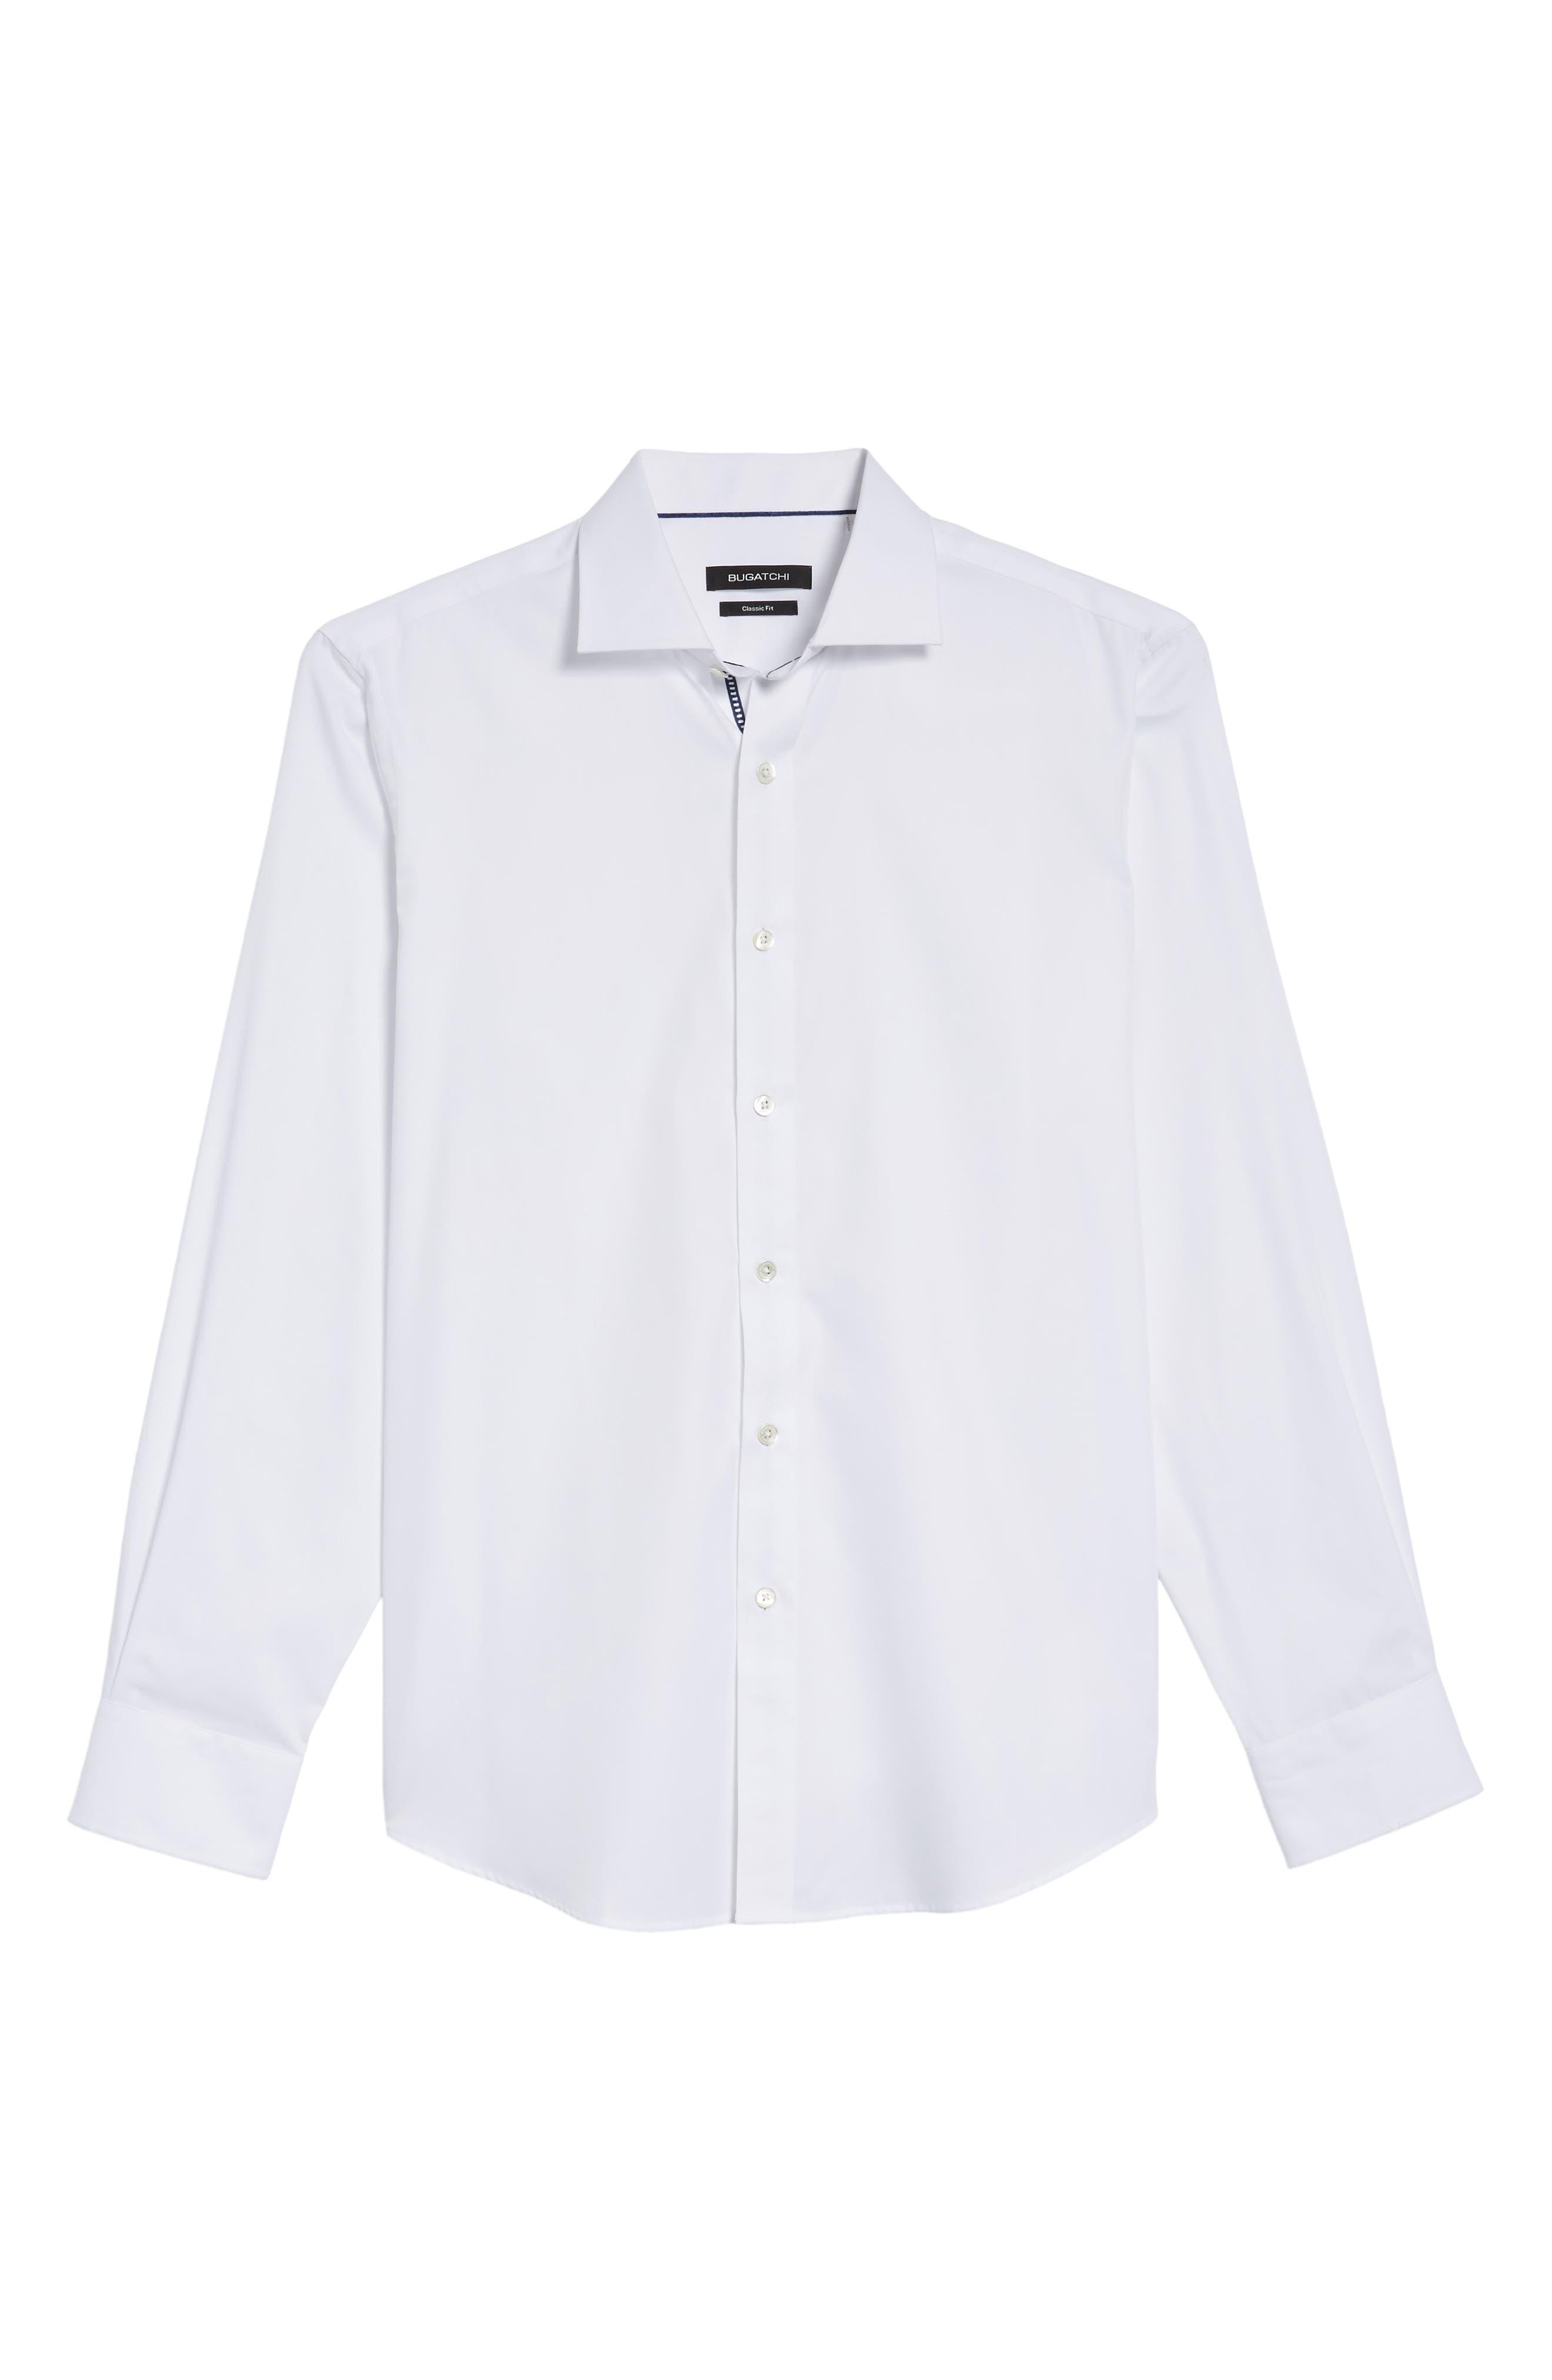 Classic Fit Sport Shirt,                             Alternate thumbnail 6, color,                             White